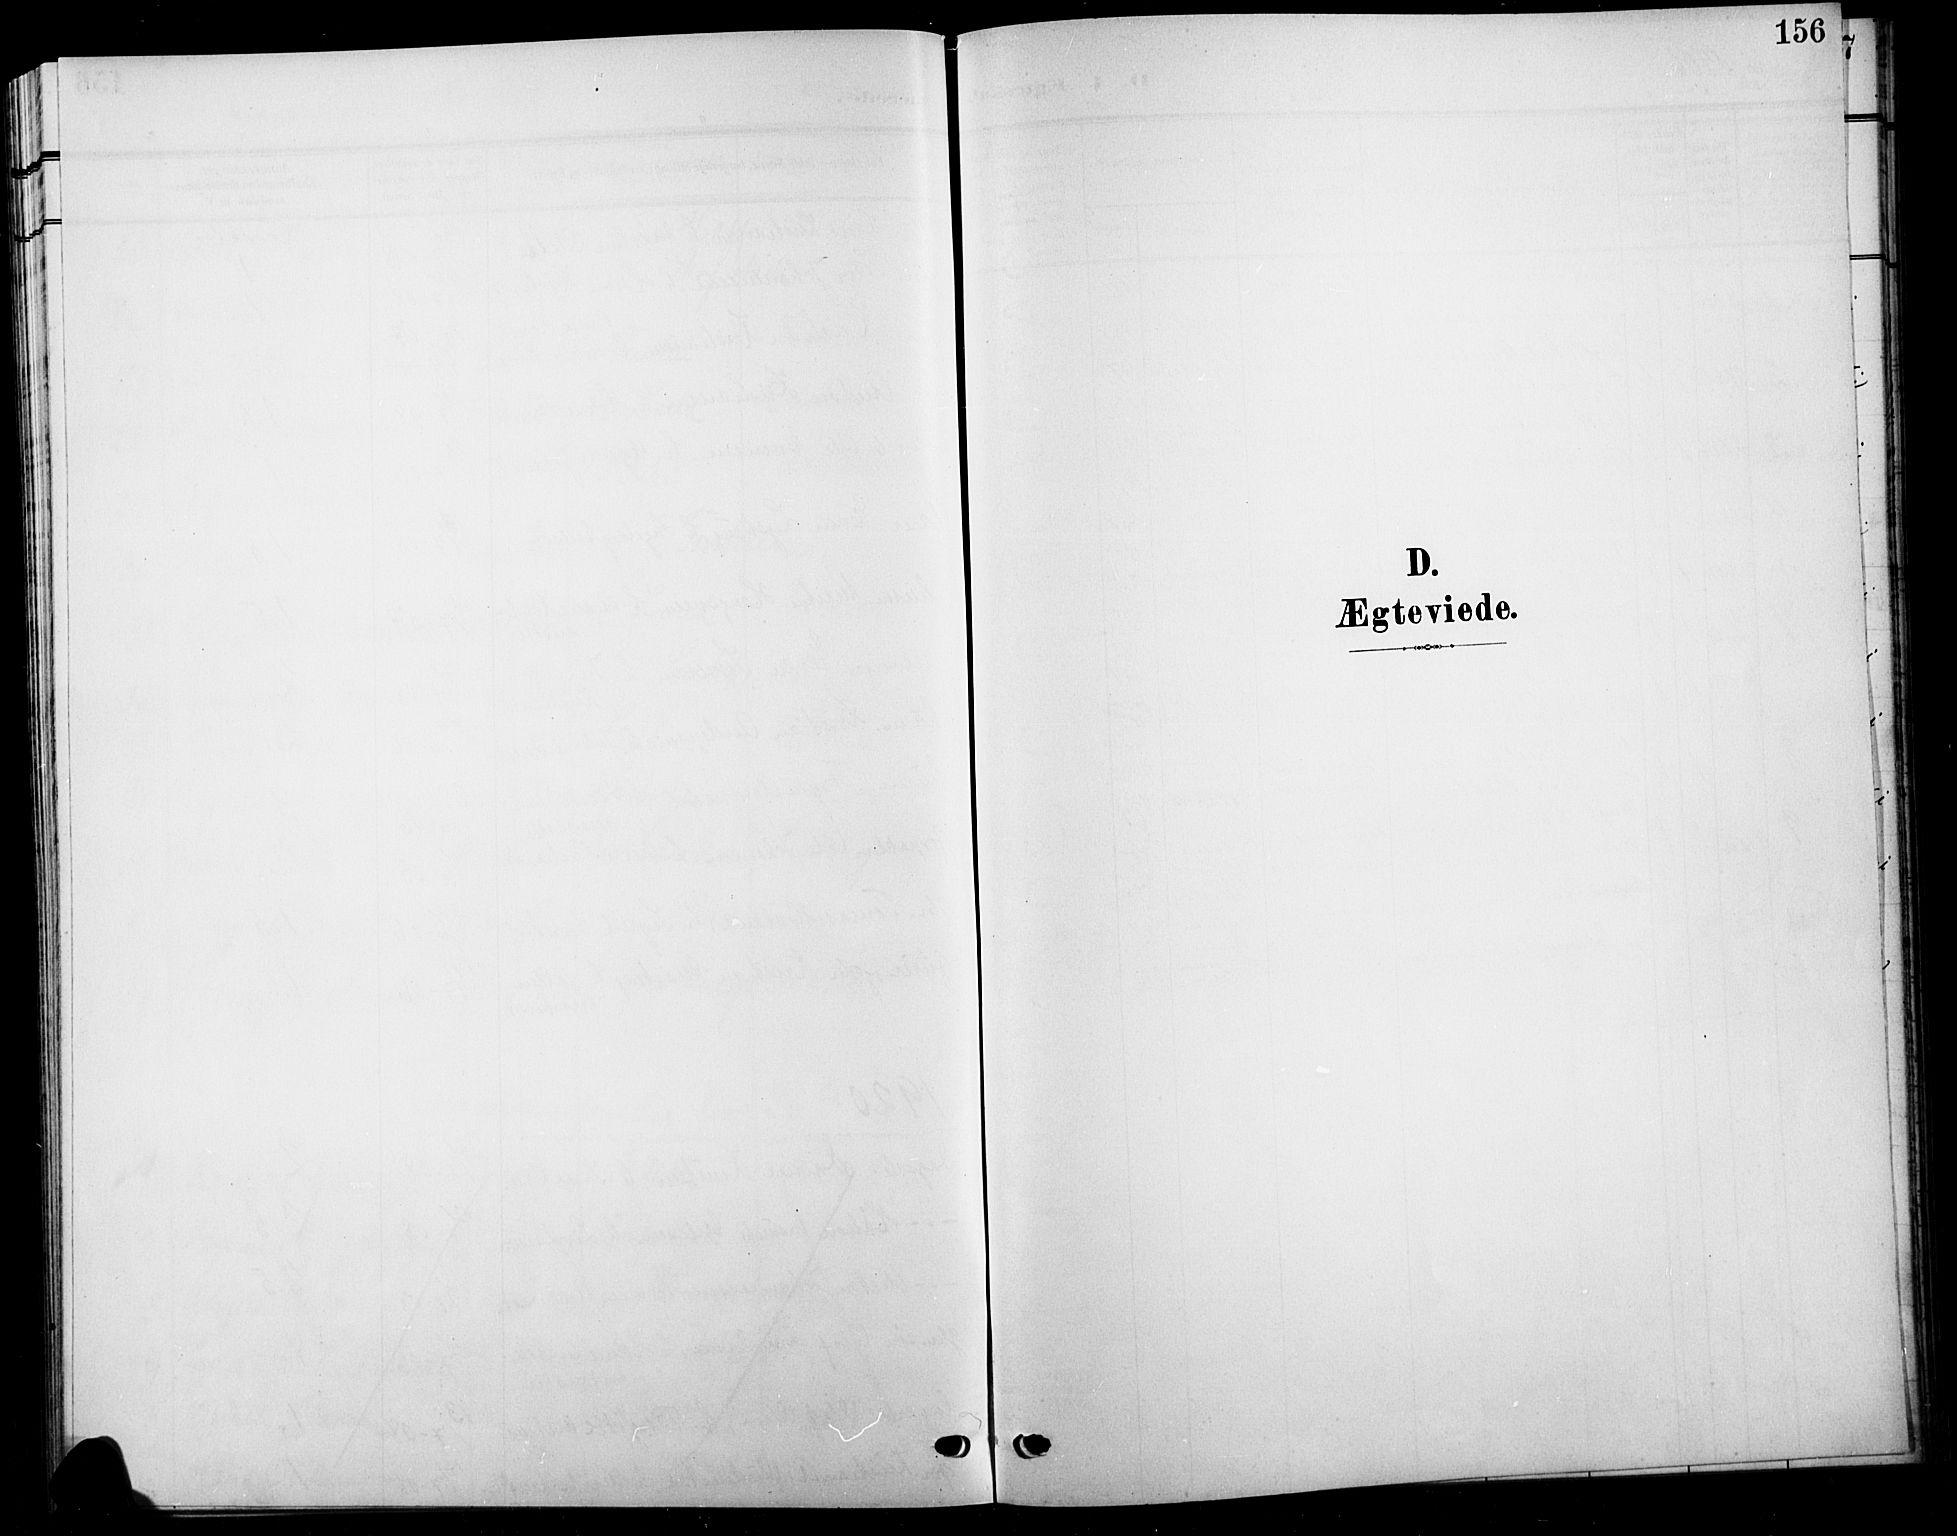 SAH, Biri prestekontor, Klokkerbok nr. 5, 1906-1919, s. 156